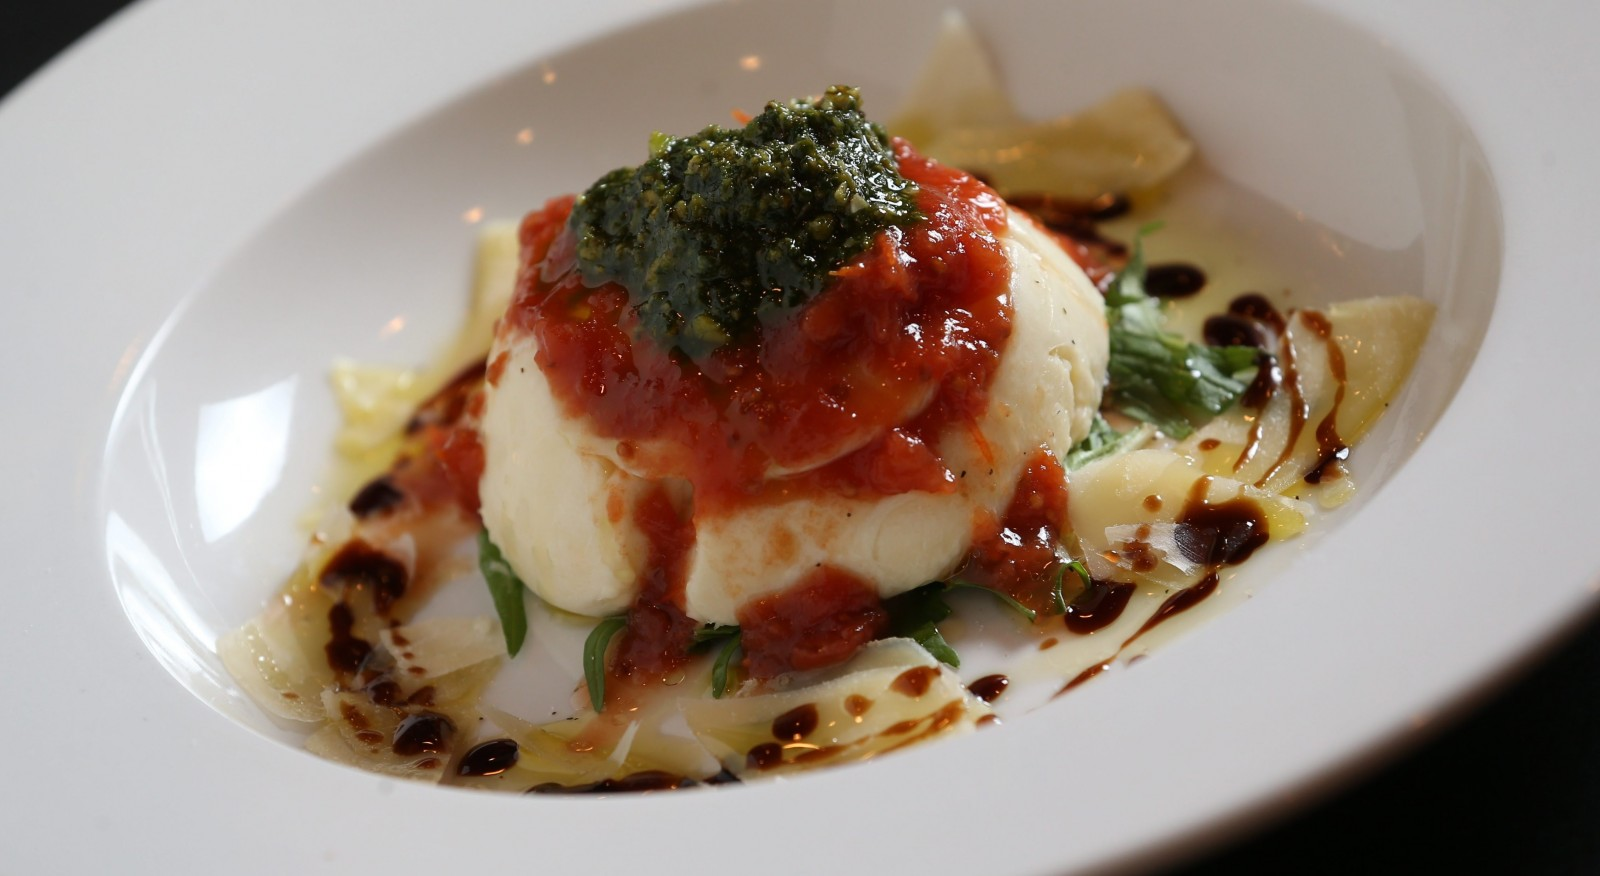 House-made stuffed mozzarella and ricotta, tomato jam and pistachio pesto from Cipollina. (Sharon Cantillon/Buffalo News)